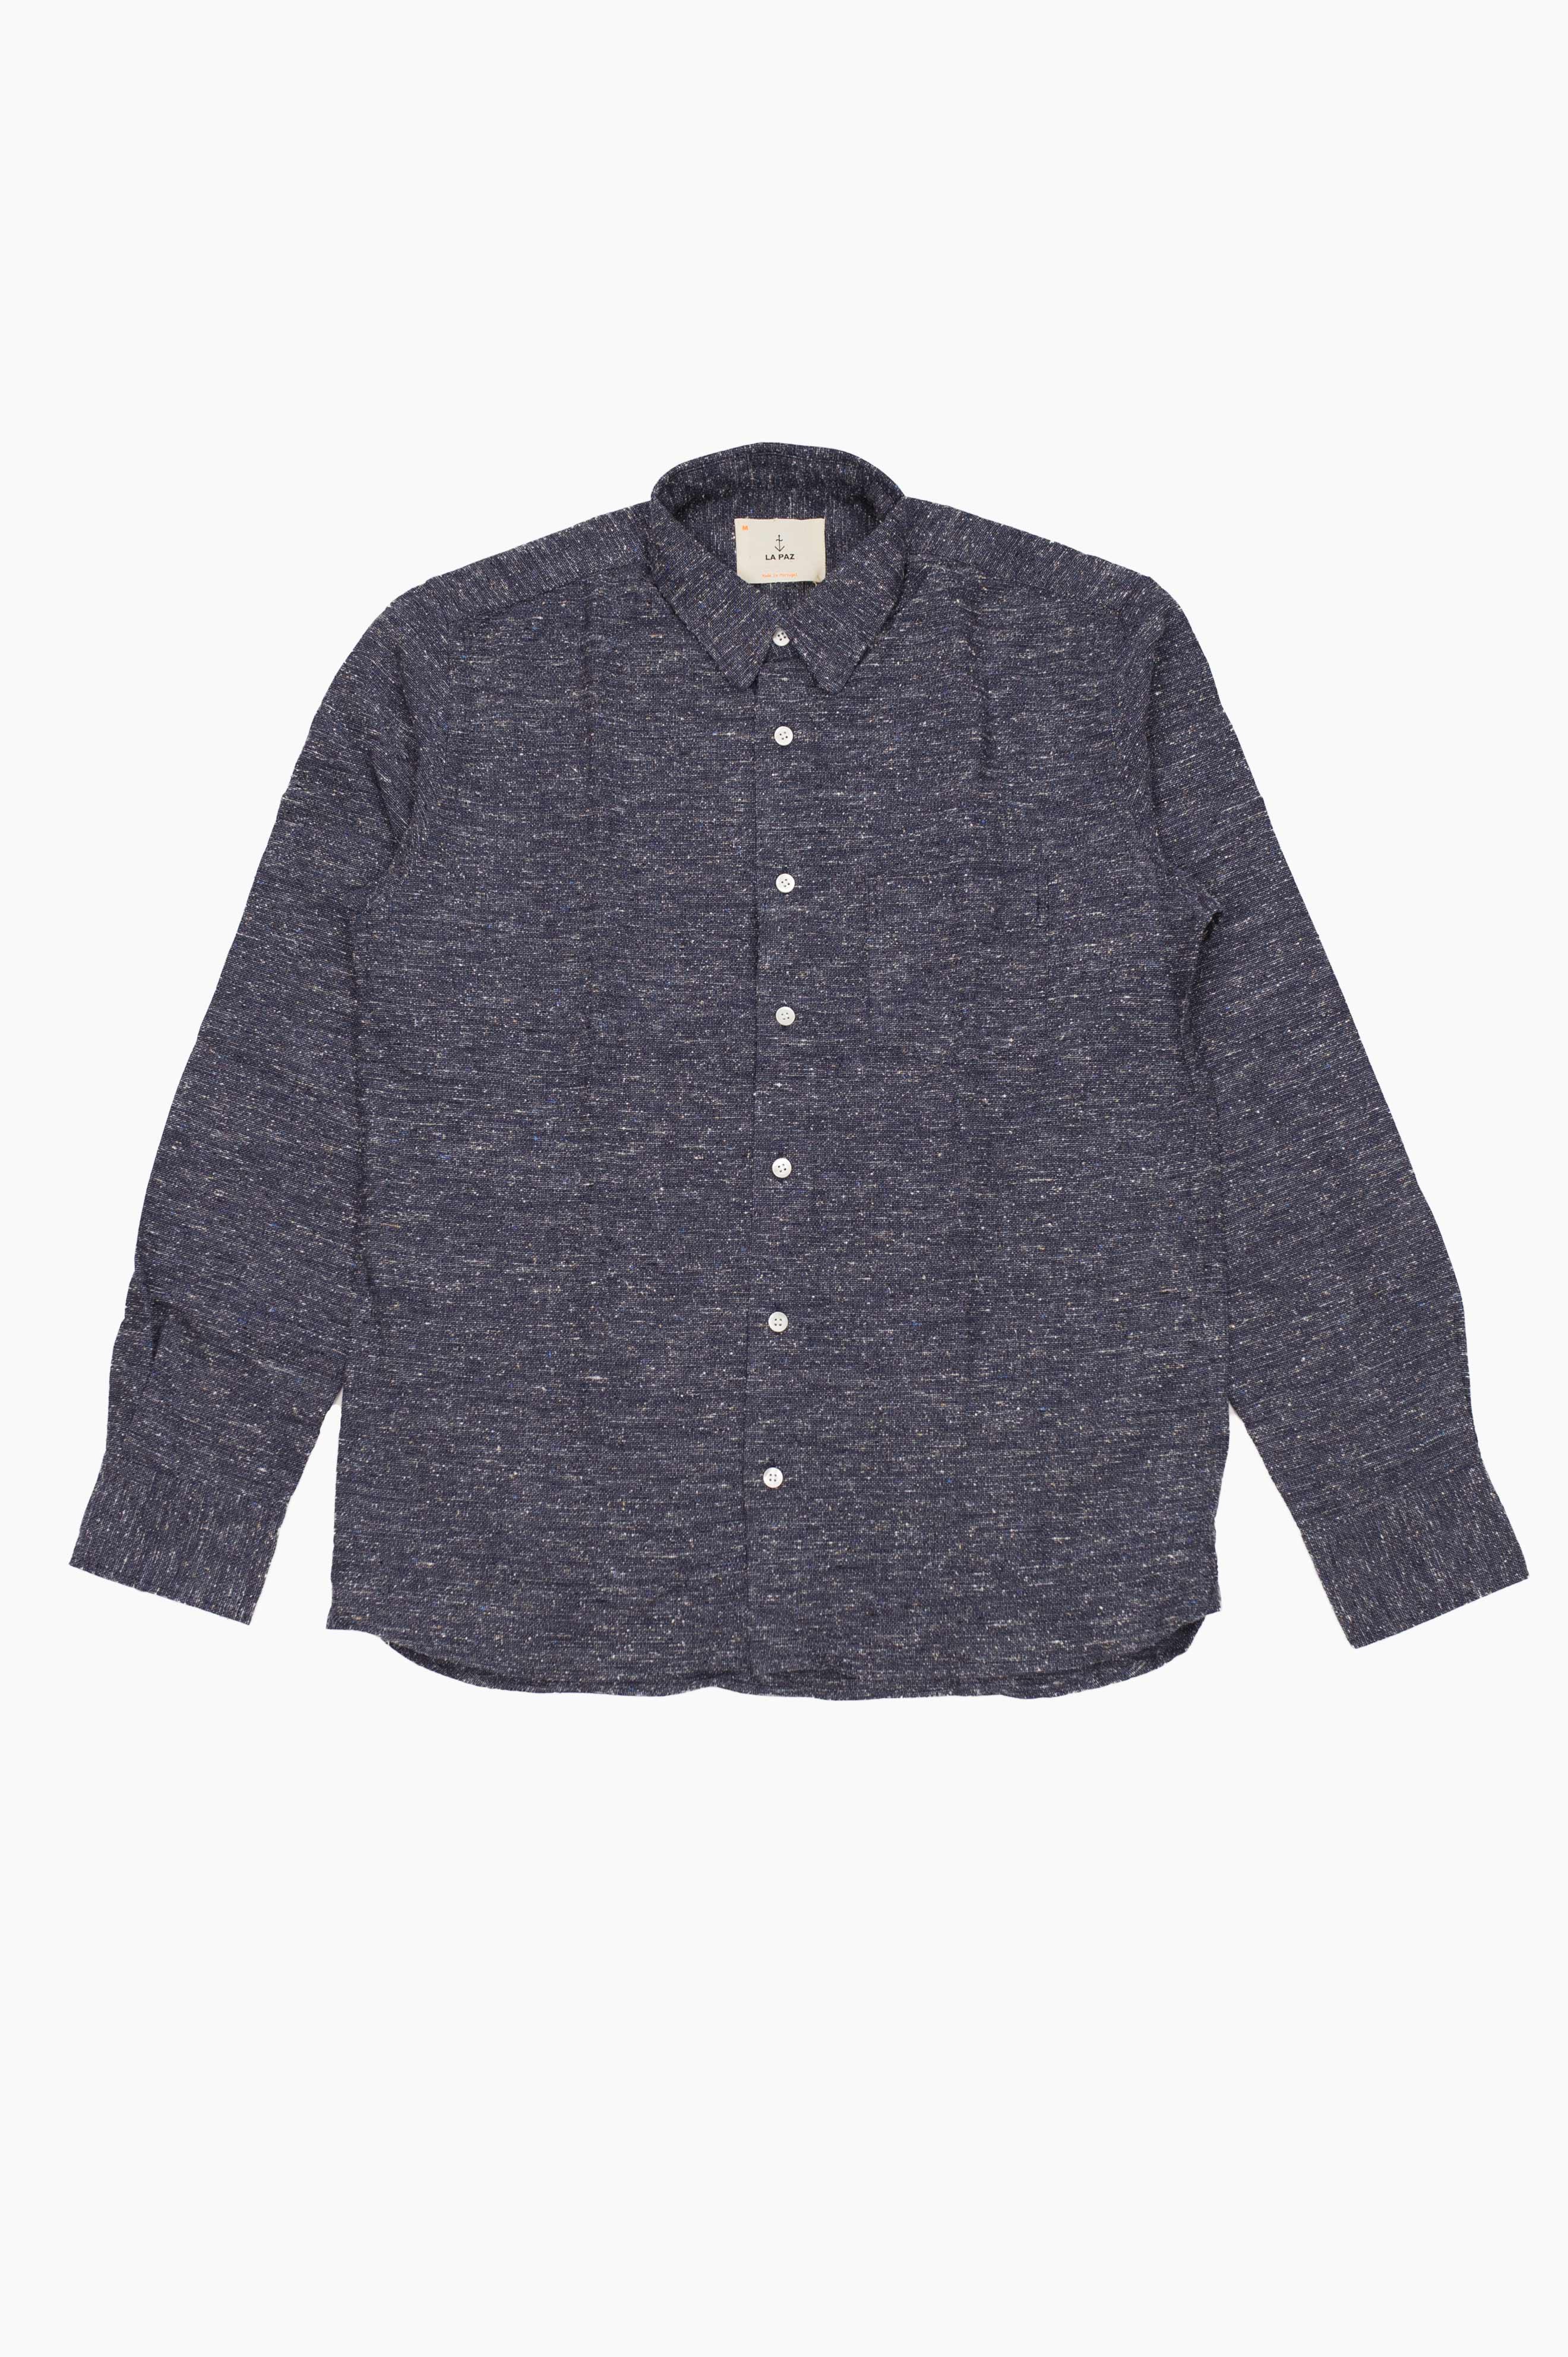 Lopes Shirt Blue Navy Mesc